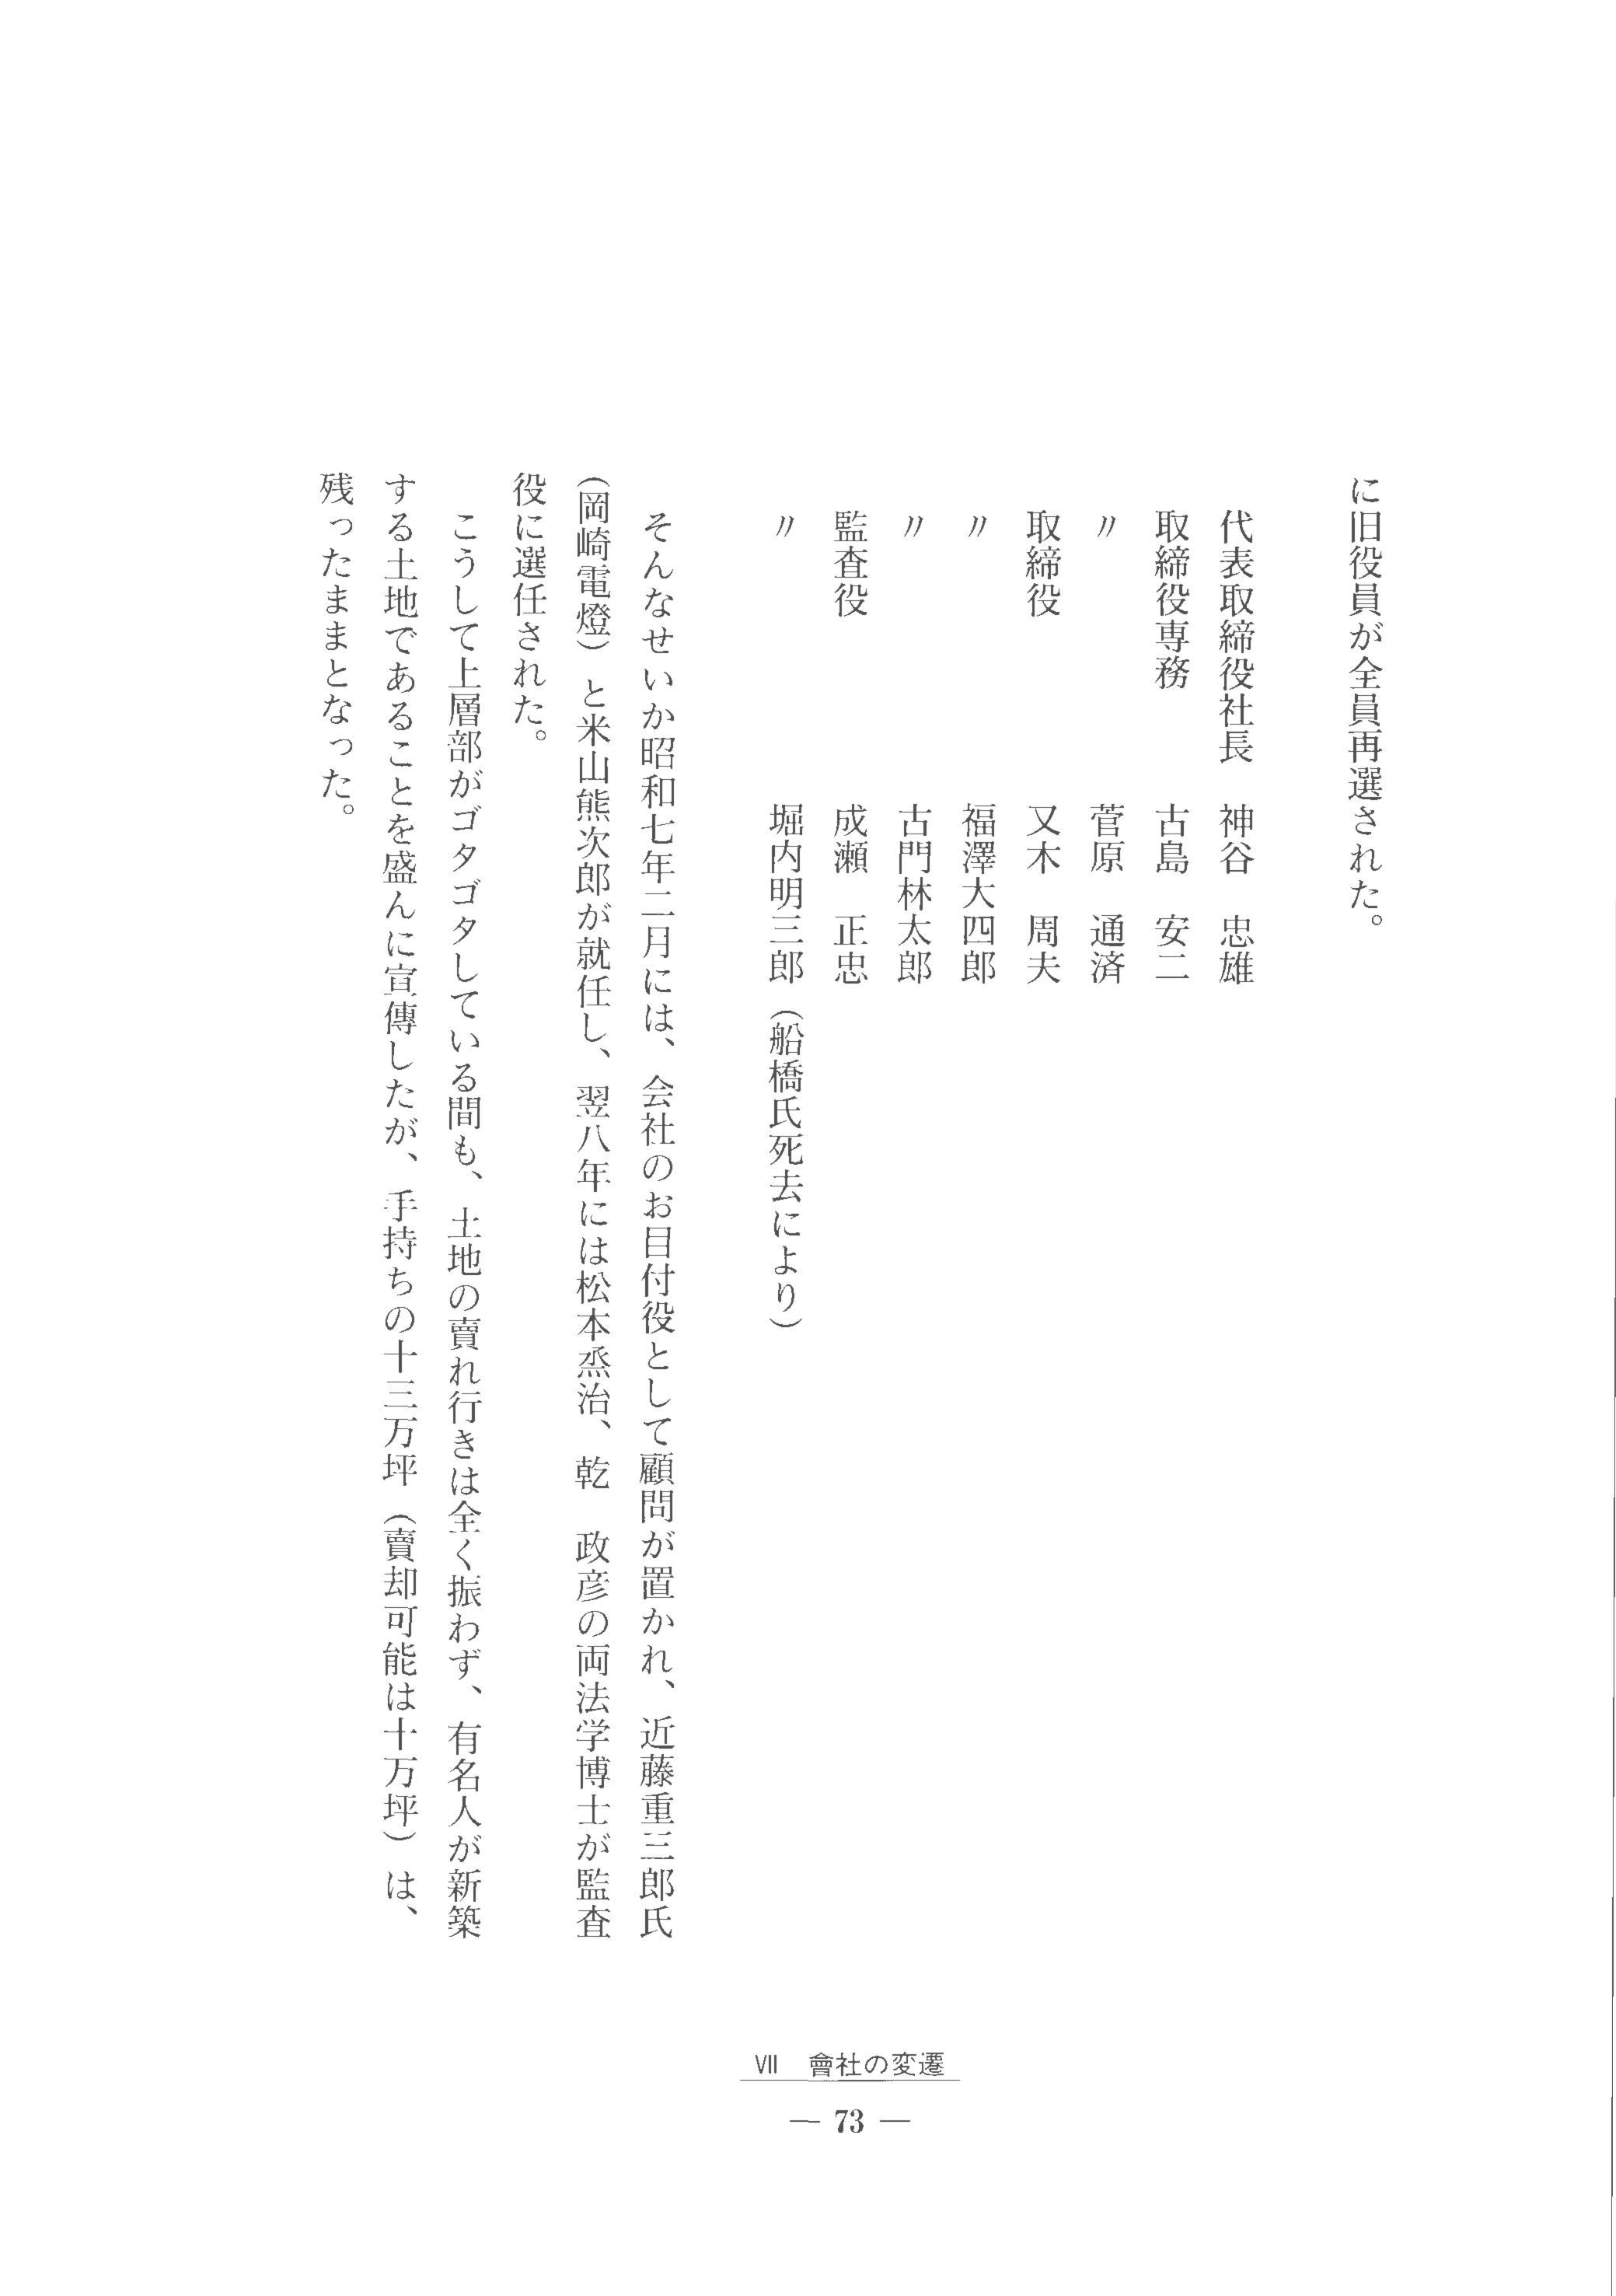 Image 75.jpeg